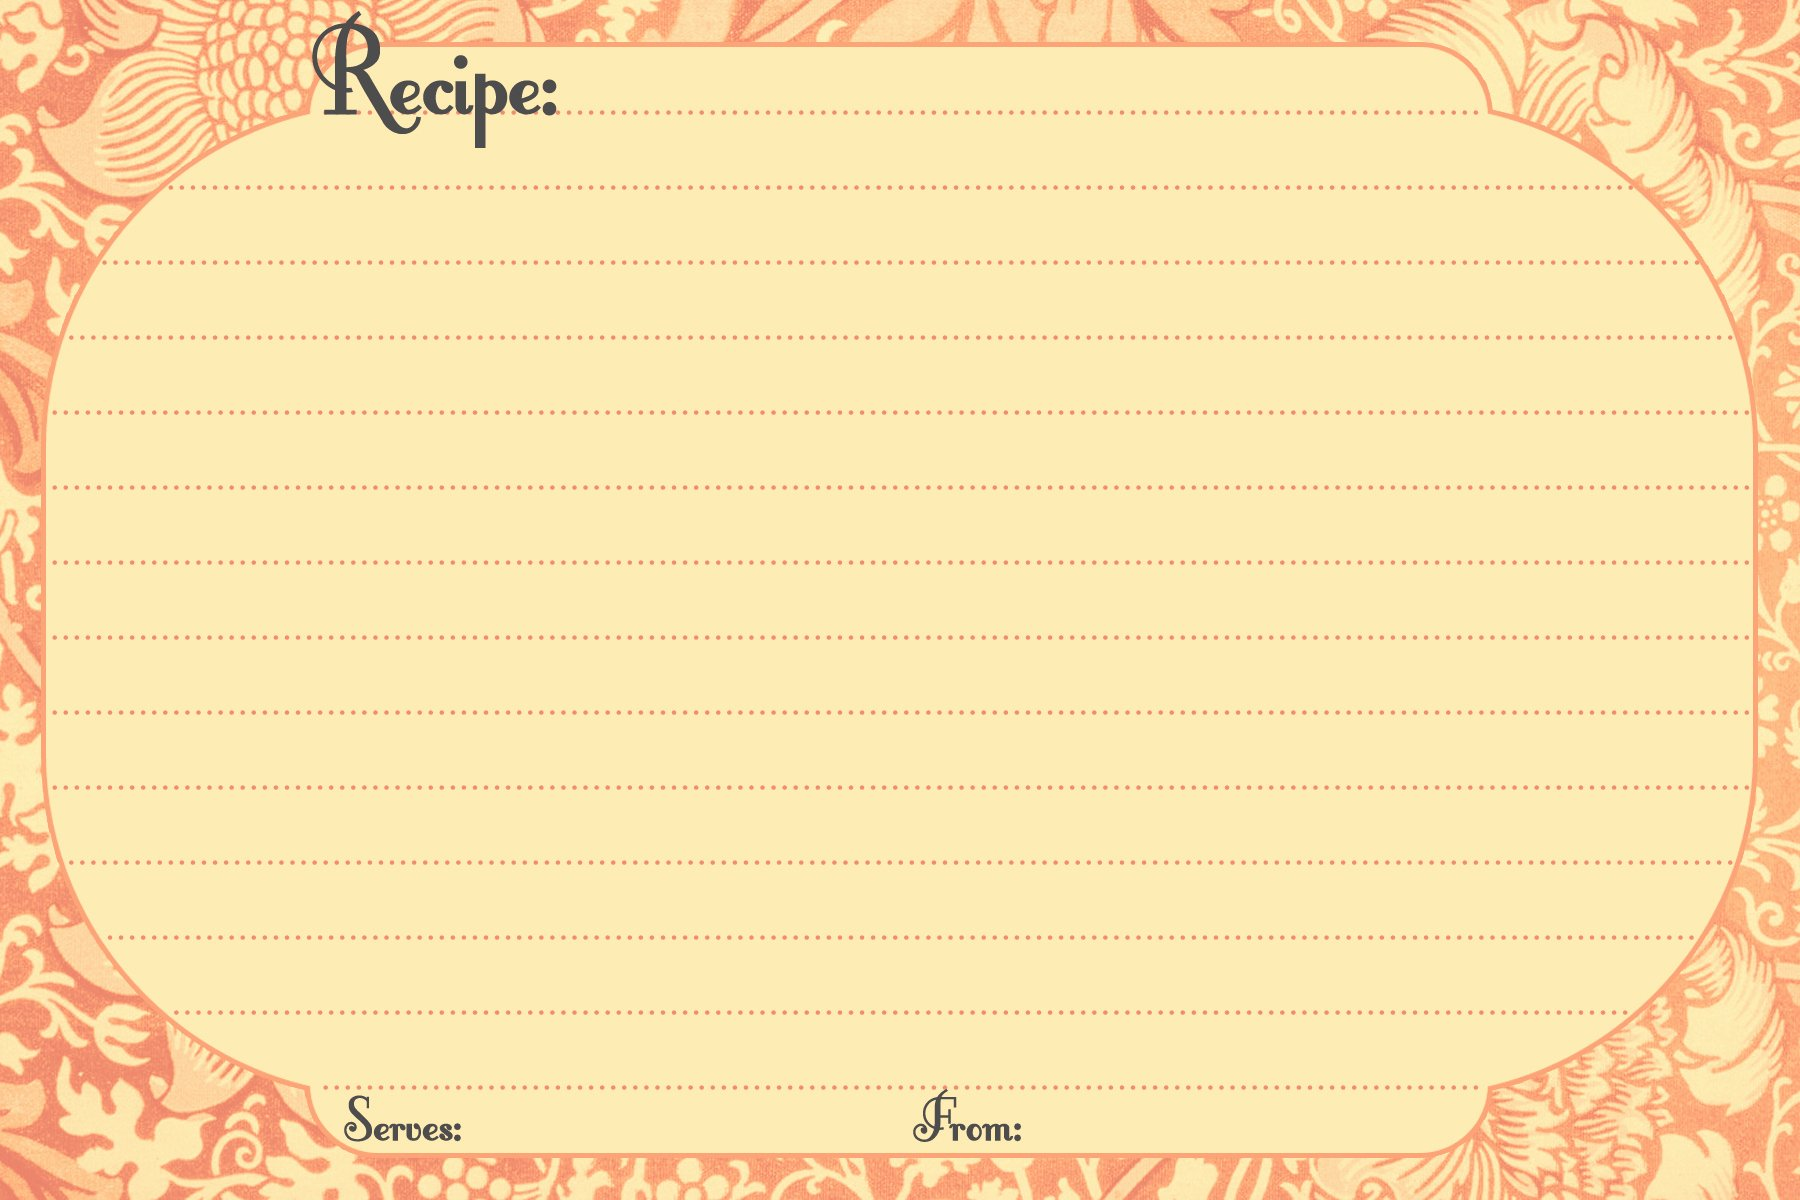 Direction Card Template Microsoft Word Elegant Free Printable Recipe Cards